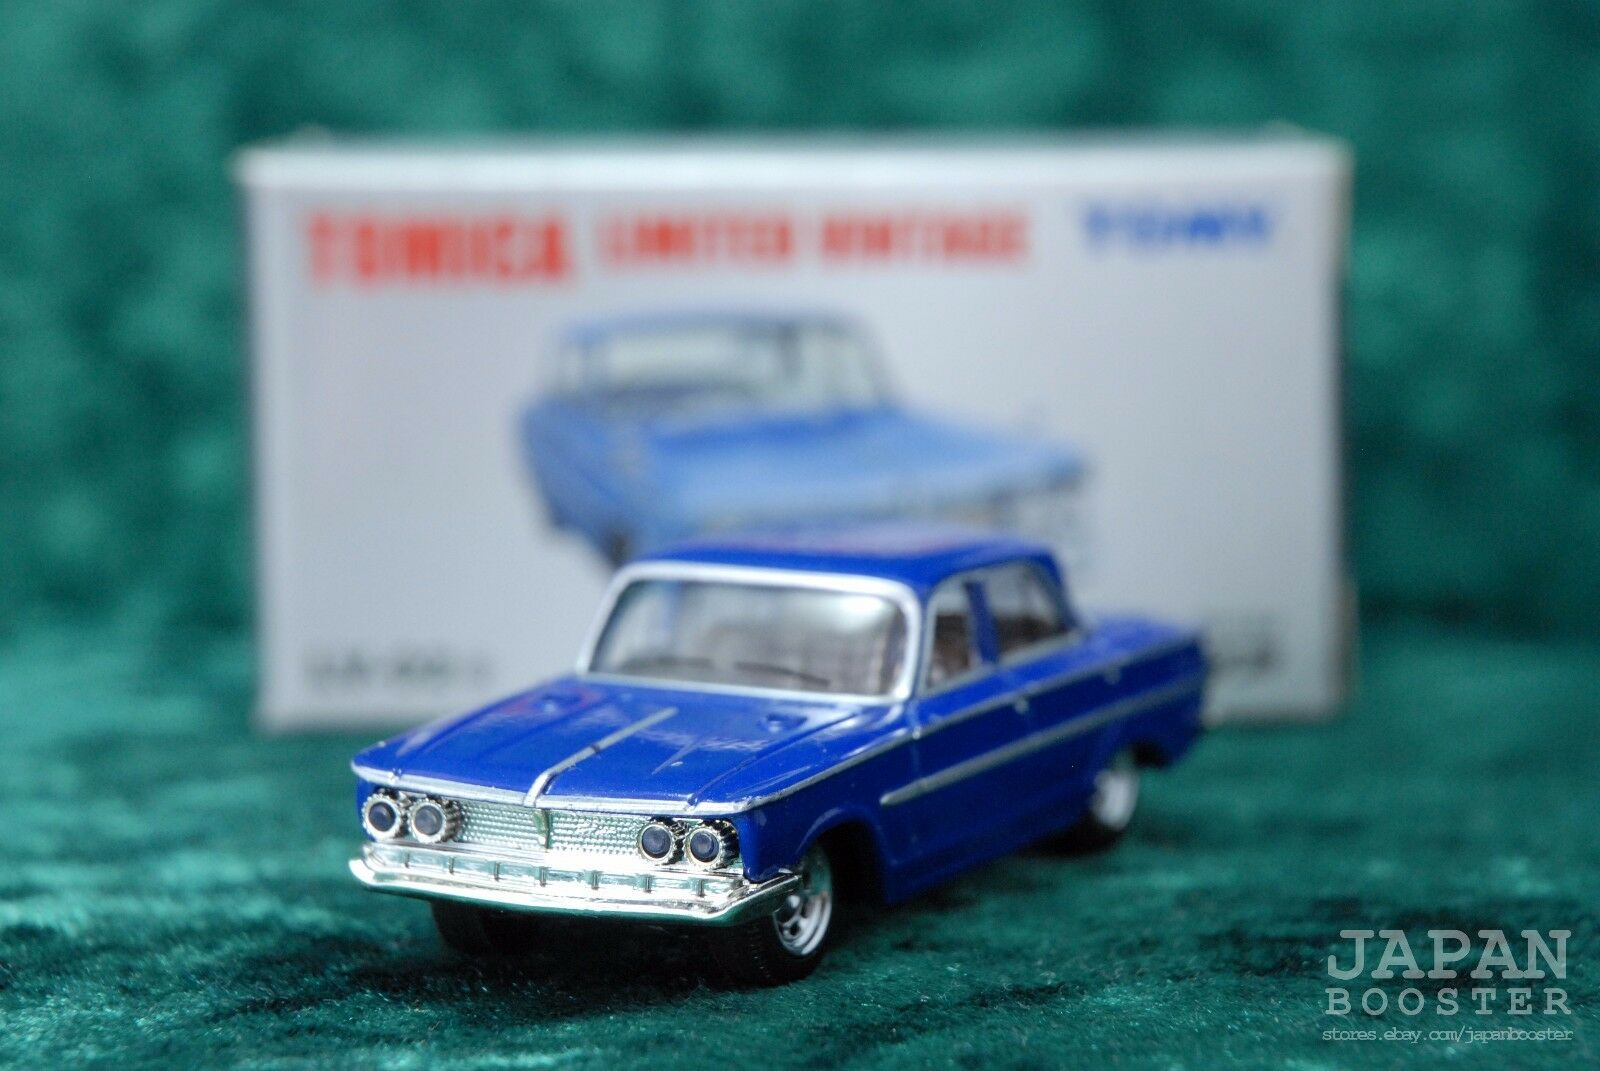 Tomica Tomytec Limited Vintage Lv 02e Prince Gloria 1 64 Zz3 For Sale Online Ebay